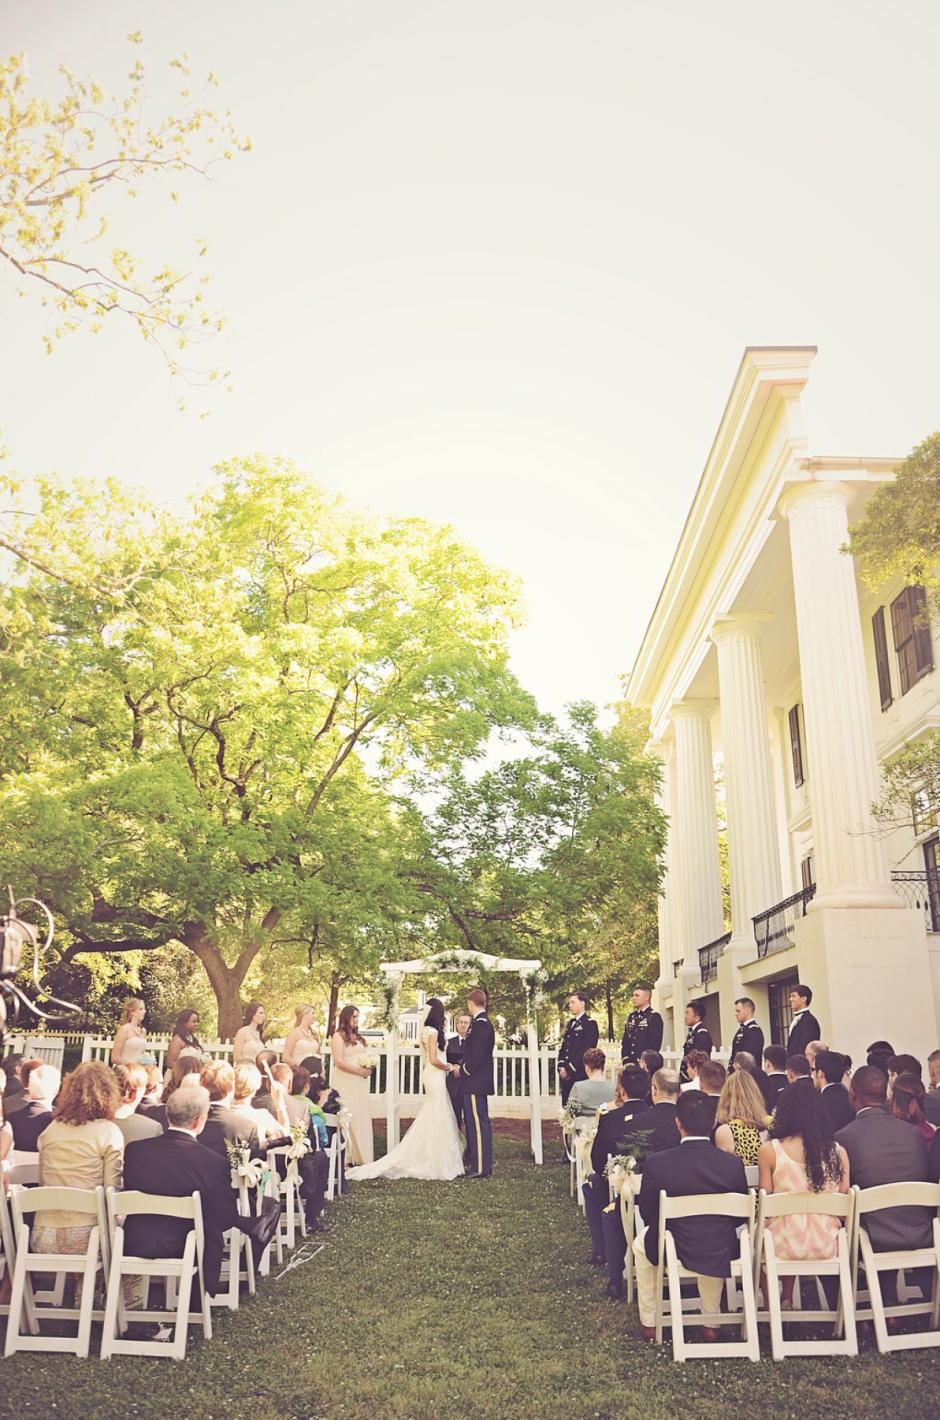 Antebellum Mansion Wedding Ceremony Georgia - Chair Rental Atlanta - Taylor Grady House